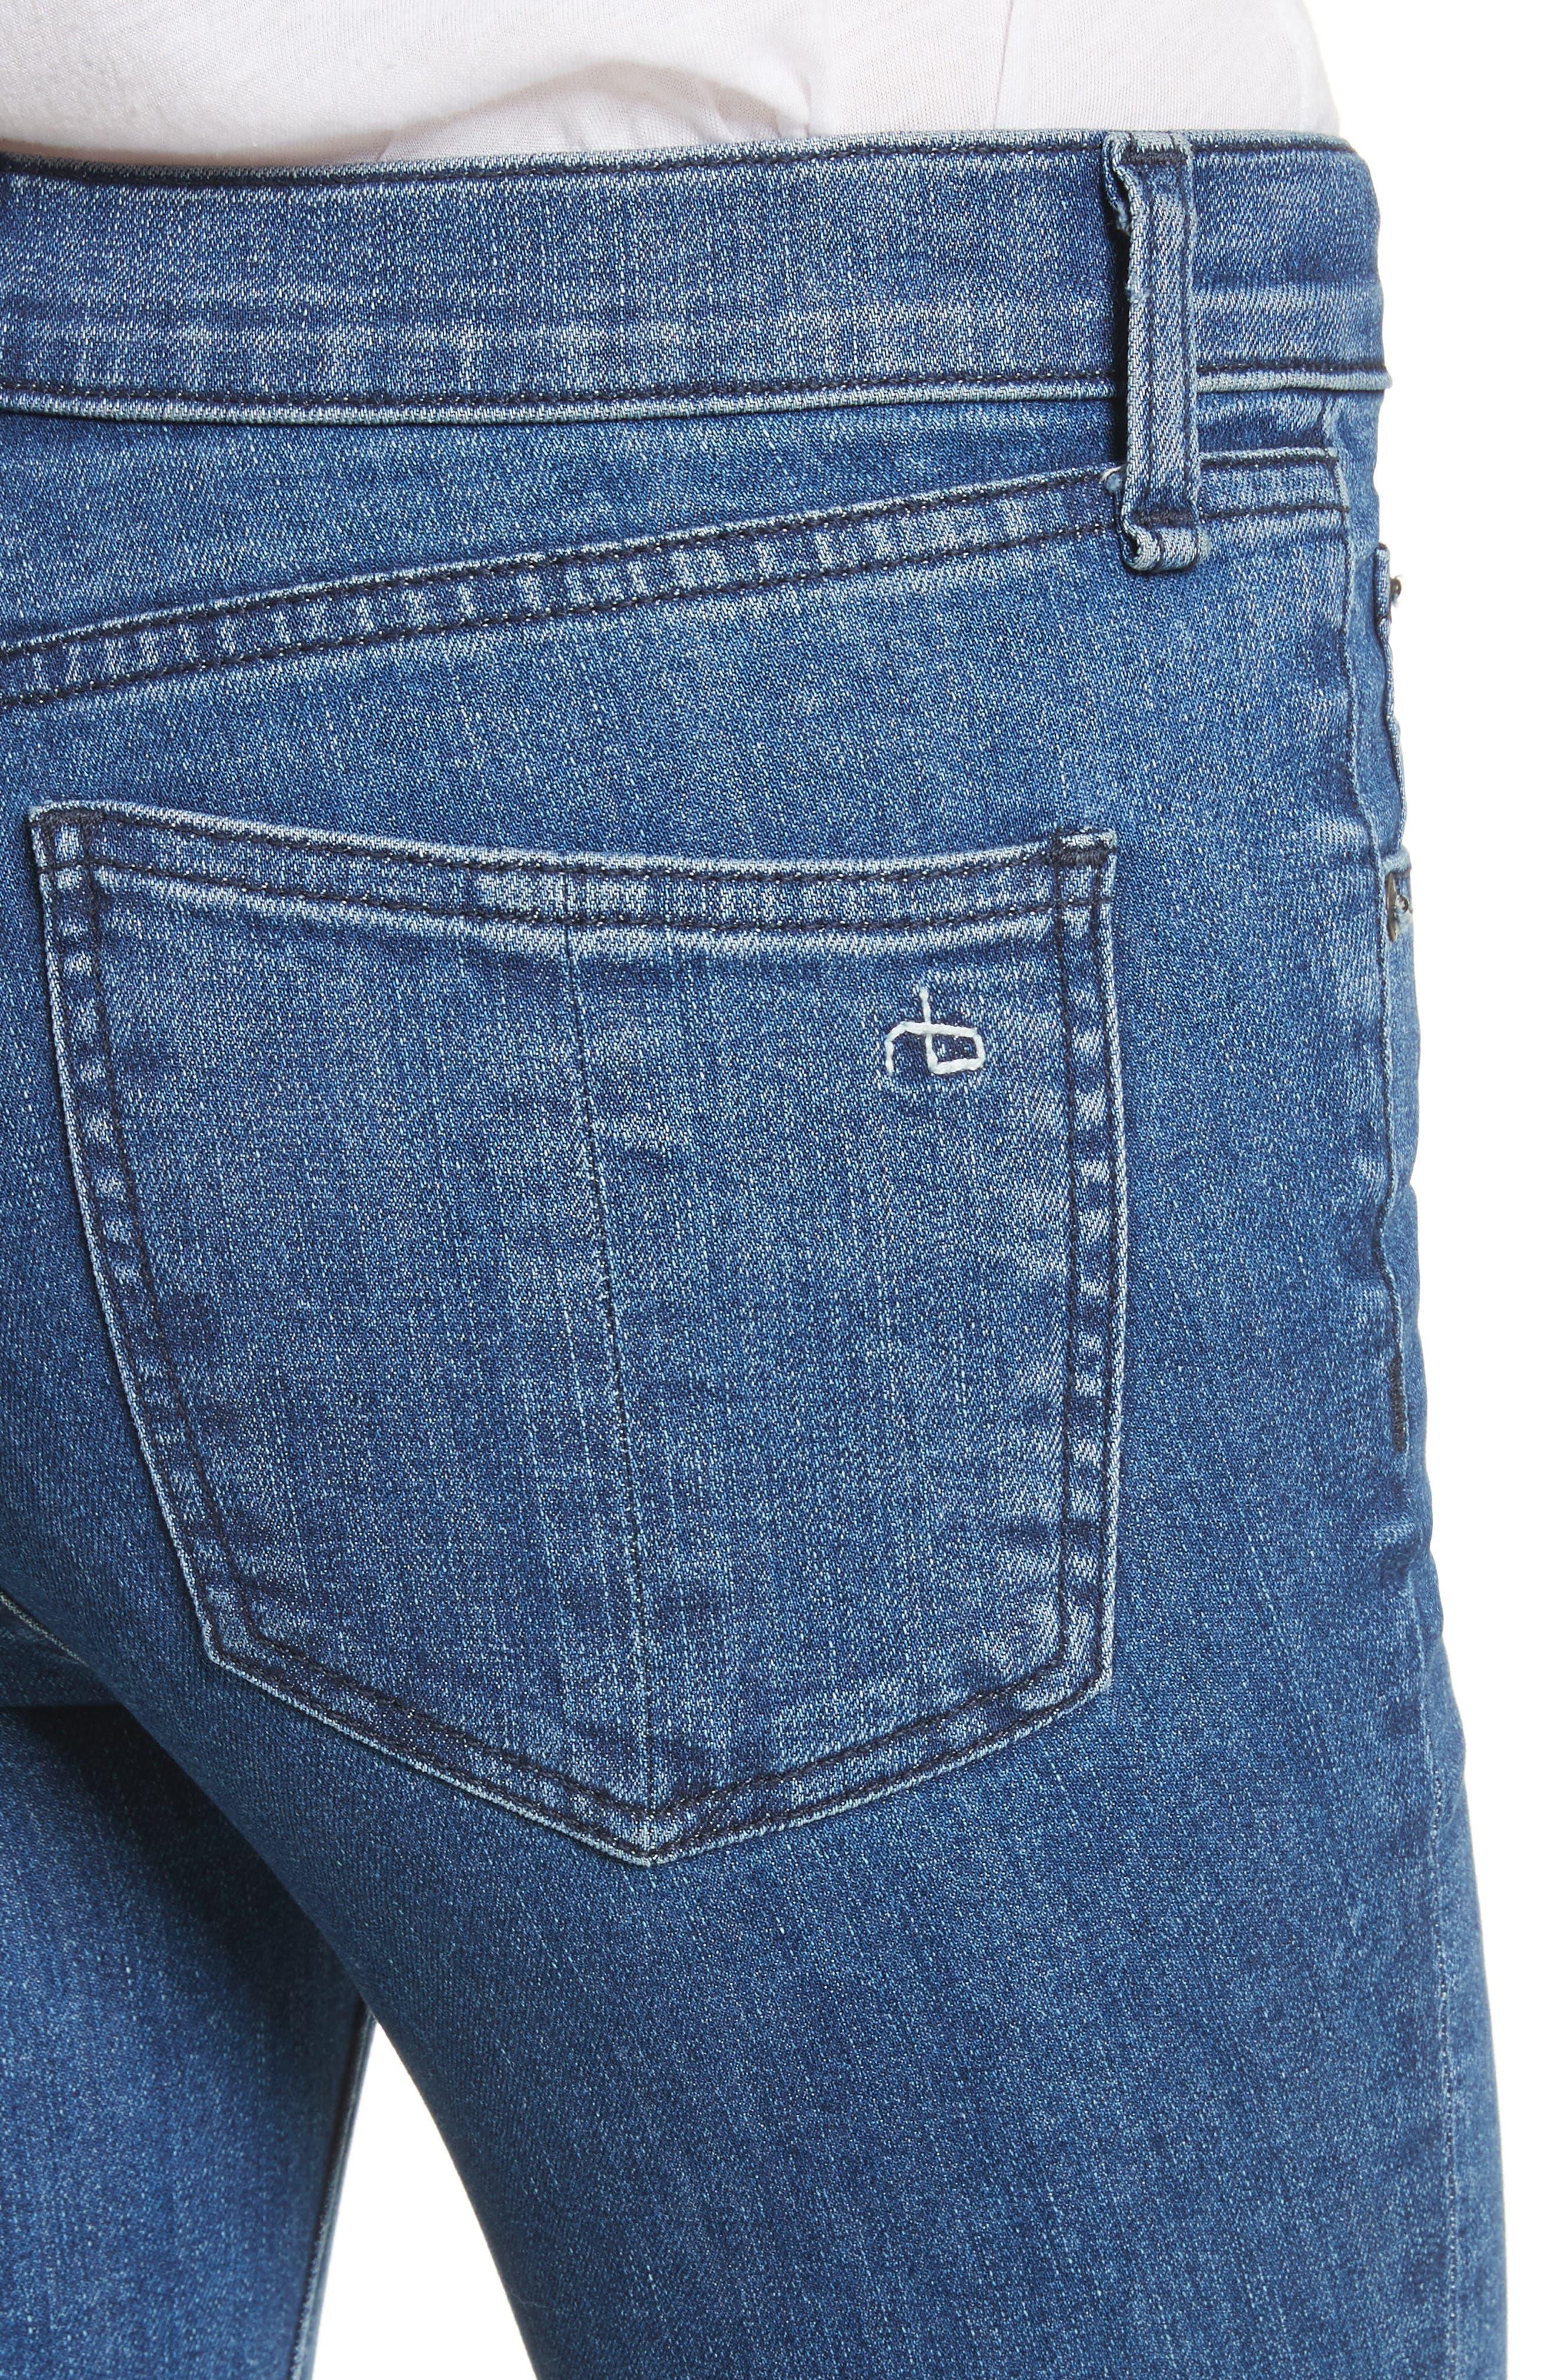 Hana High Waist Crop Bootcut Jeans,                             Alternate thumbnail 4, color,                             420